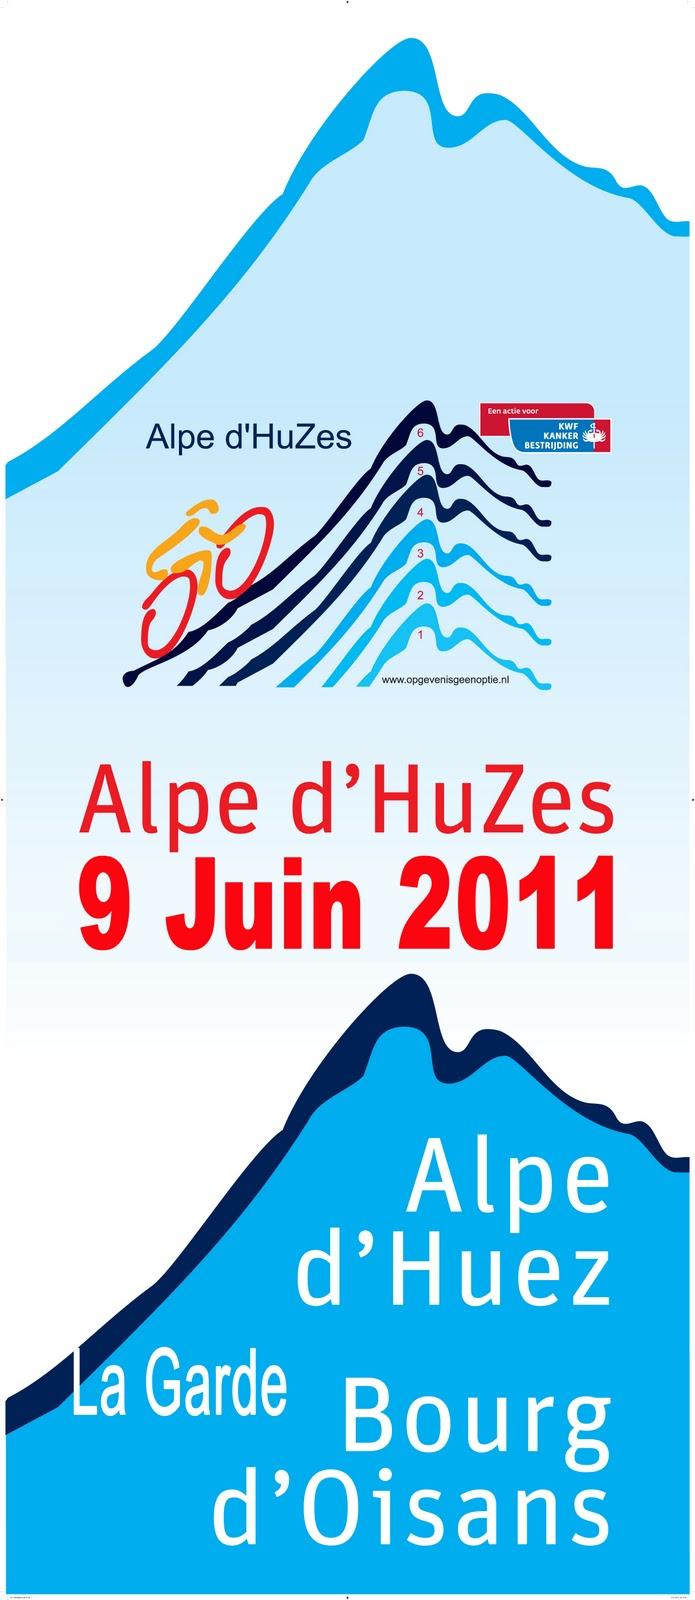 Alpe d'HuZes 2011